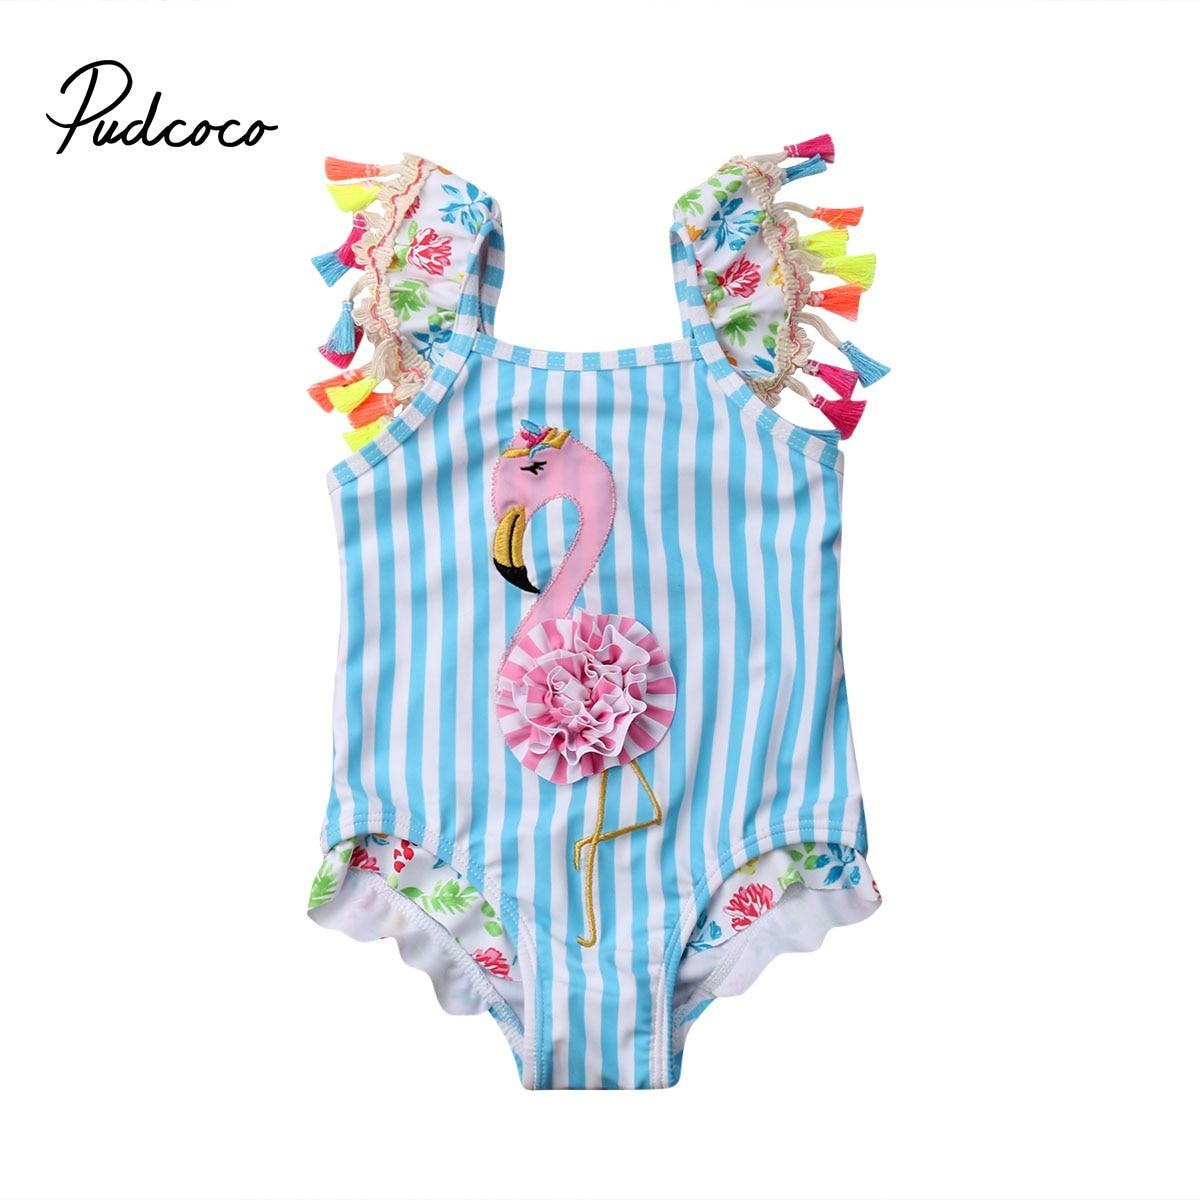 Bebé recién nacido niños bebé niñas borla de moda de vuelo manga Flamingo Bikini ropa de baño Floral traje de baño ropa de playa